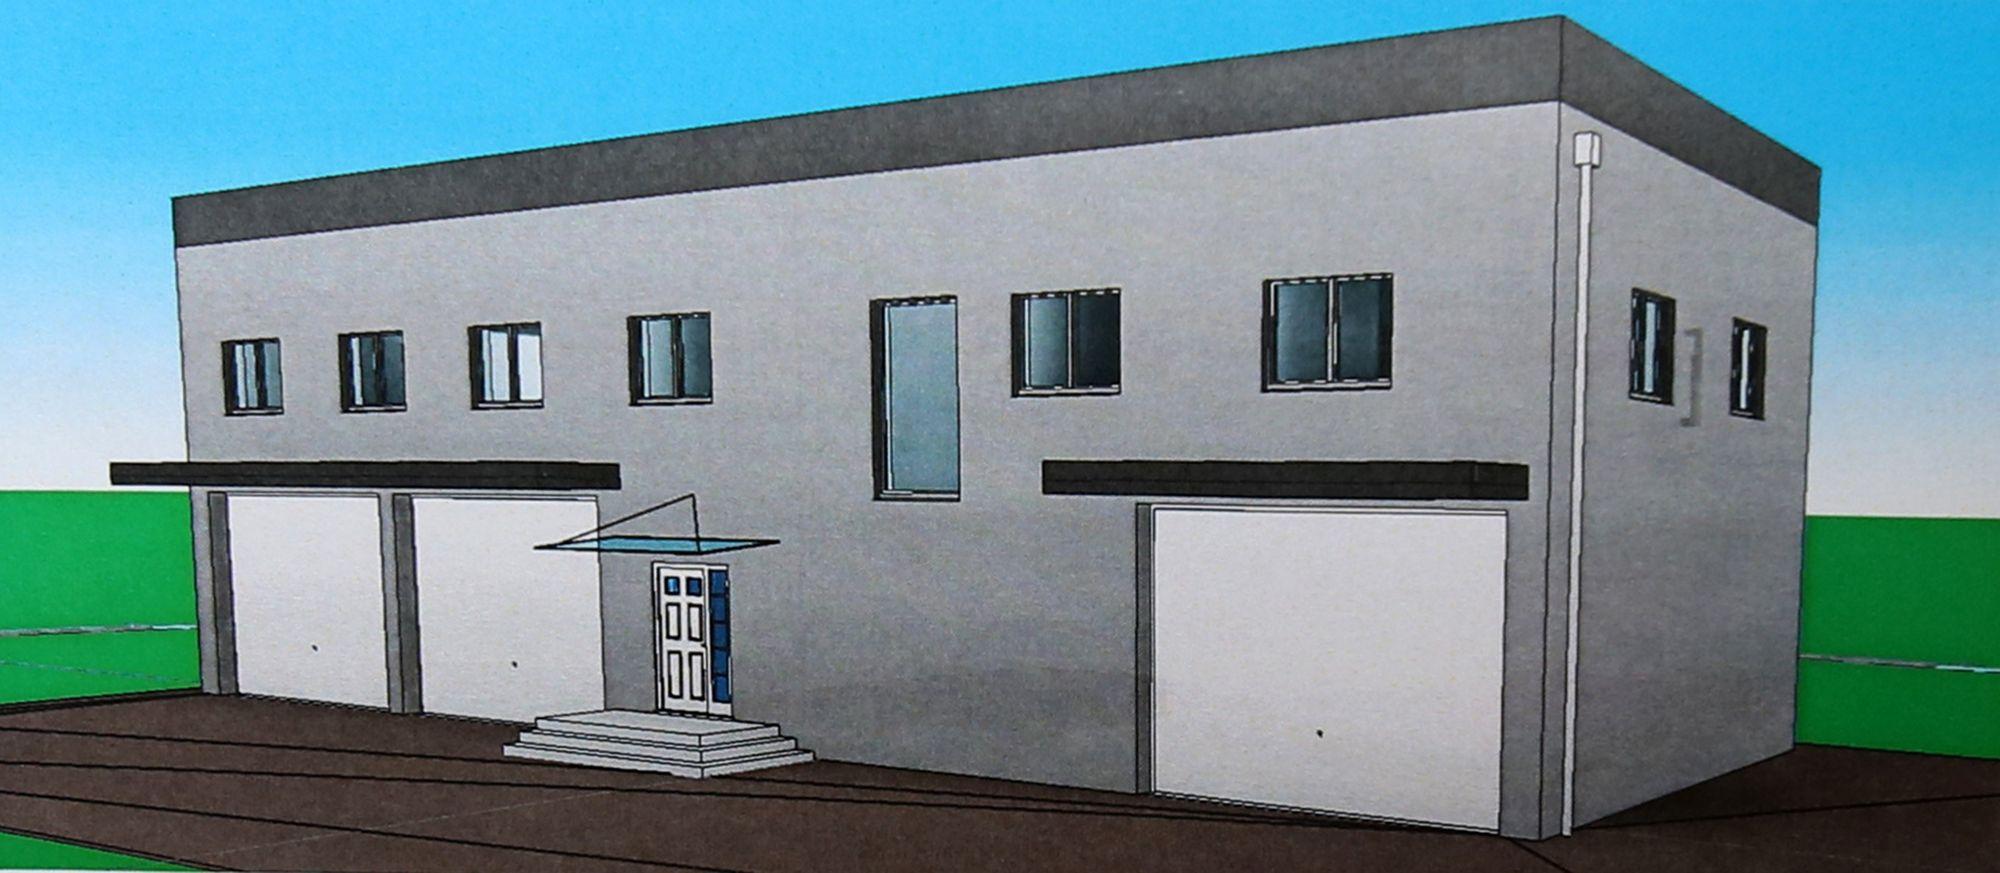 ĐELEKOVEC: Potpisan ugovor za financiranje nadogradnje Vatrogasnog doma DVD-a Đelekovec